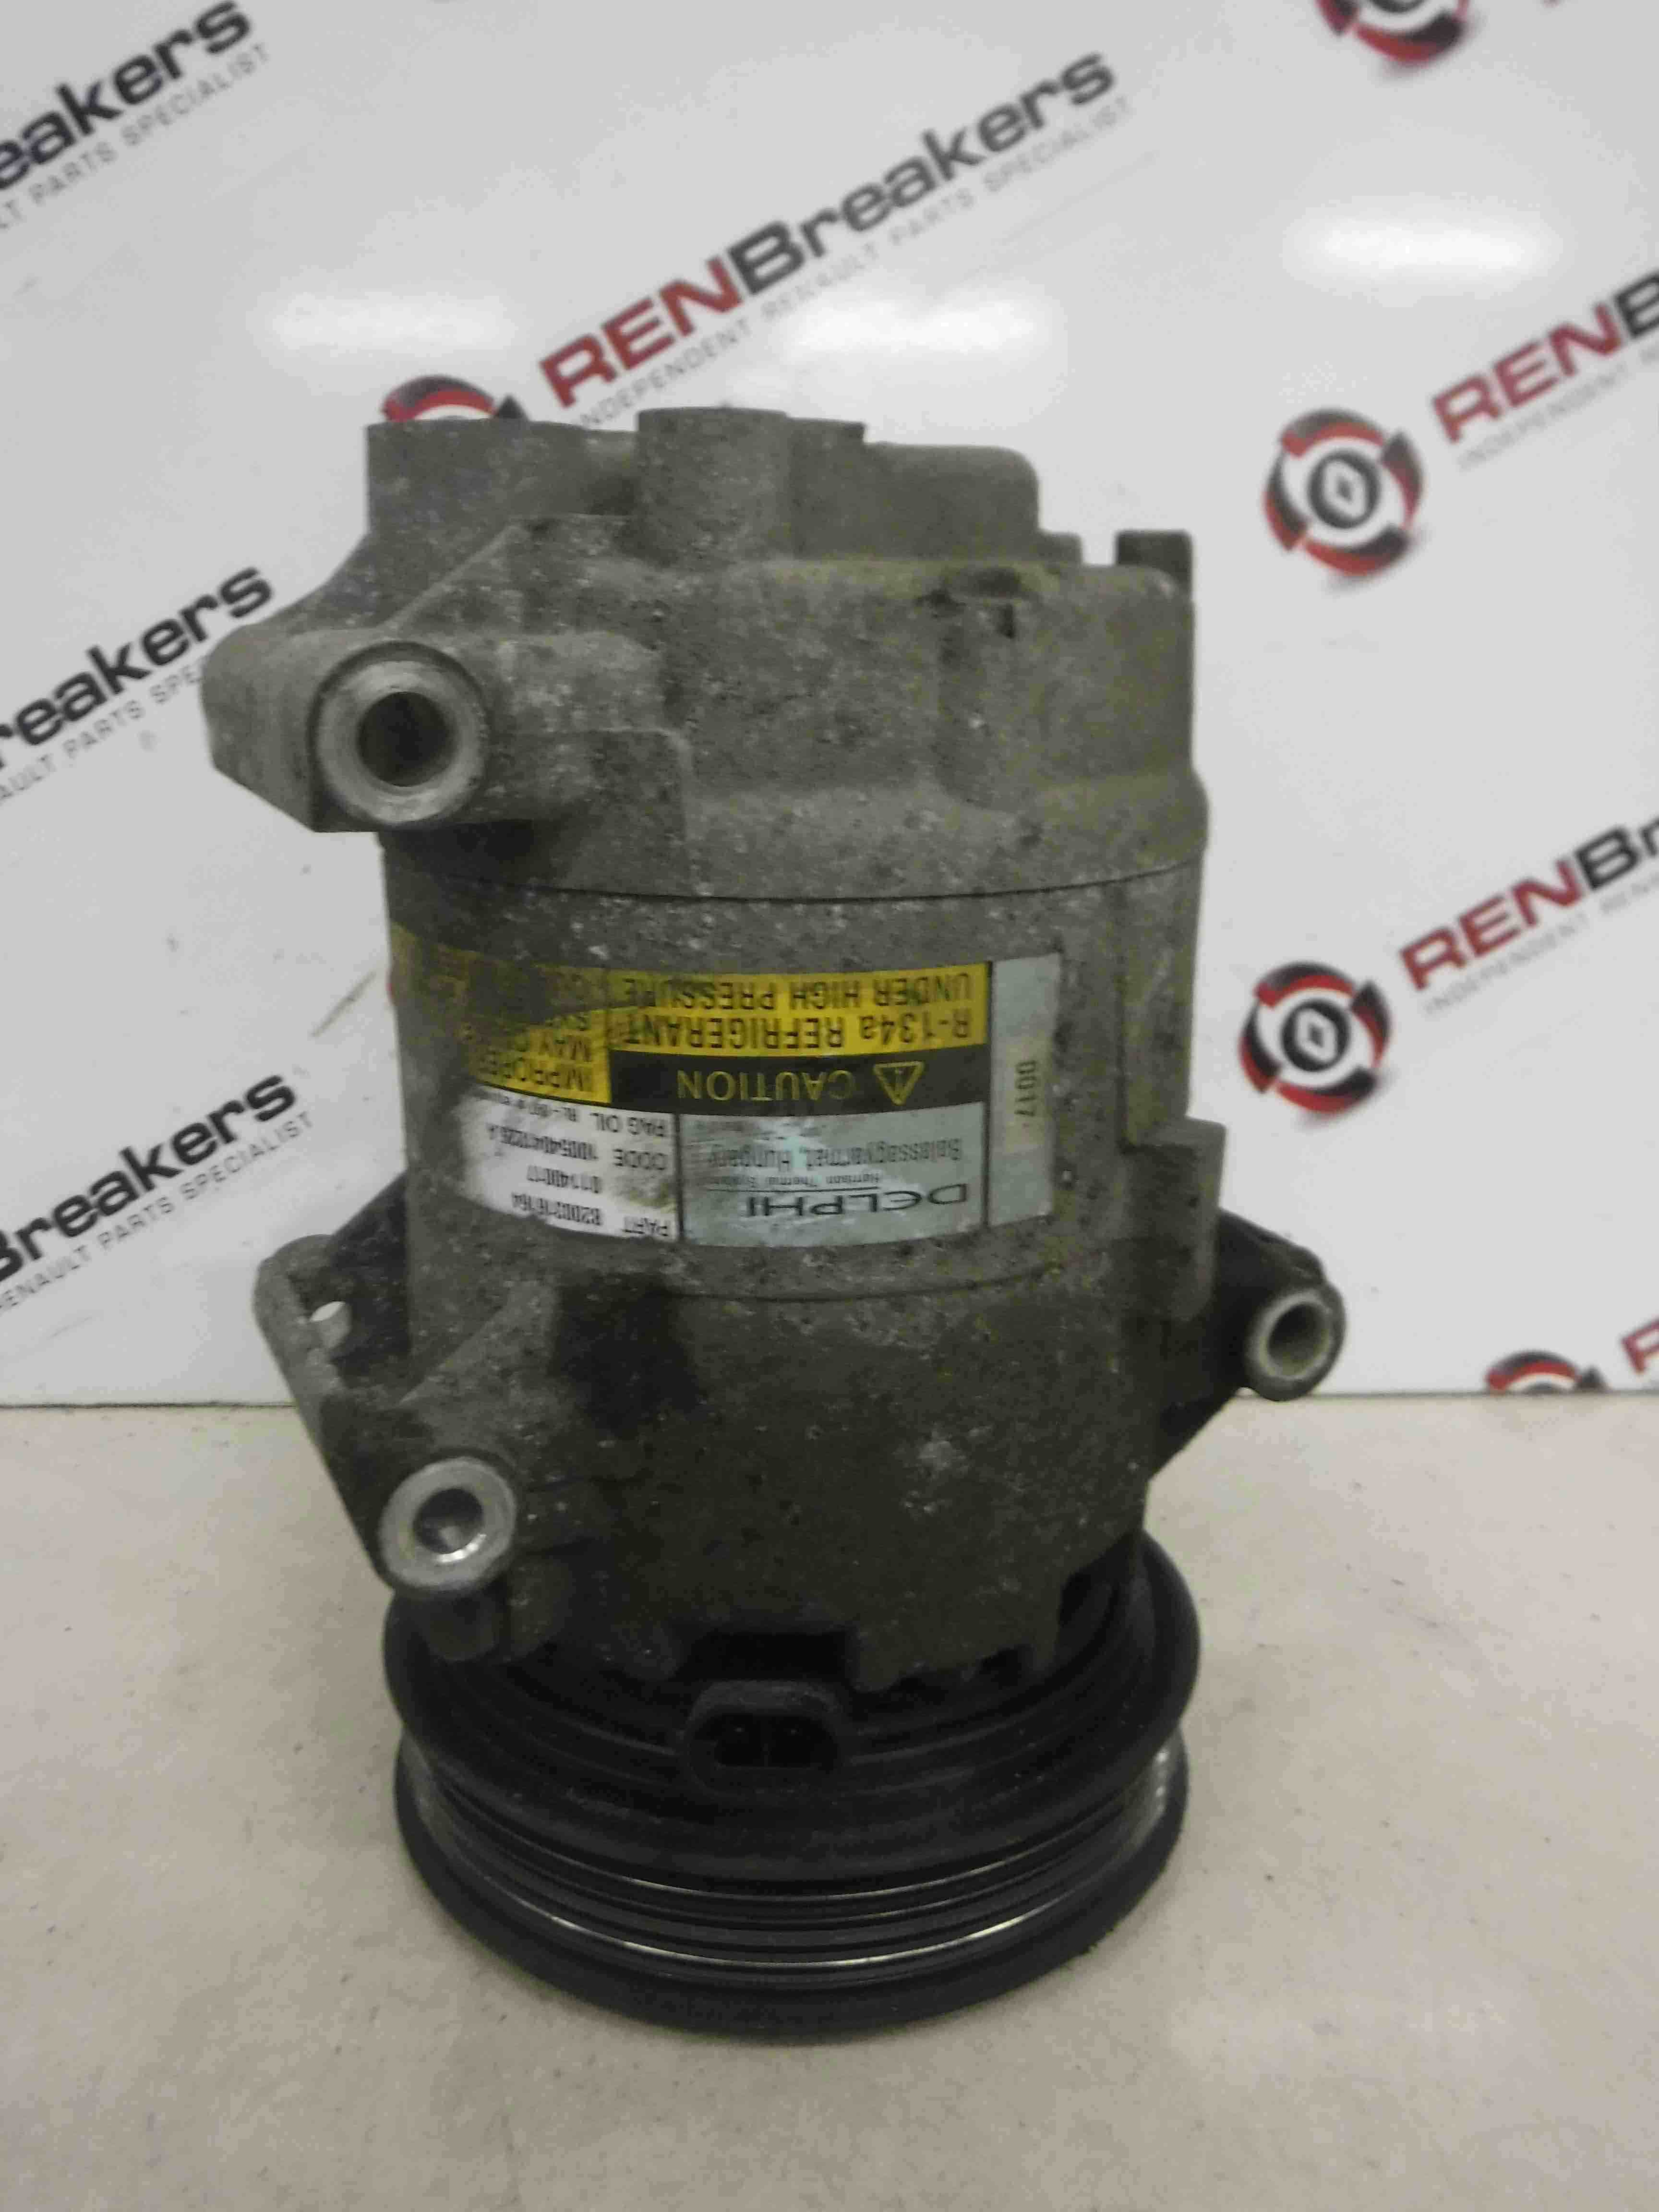 Renault Megane + Scenic 2003-2009 1.6 16v Aircon Pump Compressor Unit 8200600110